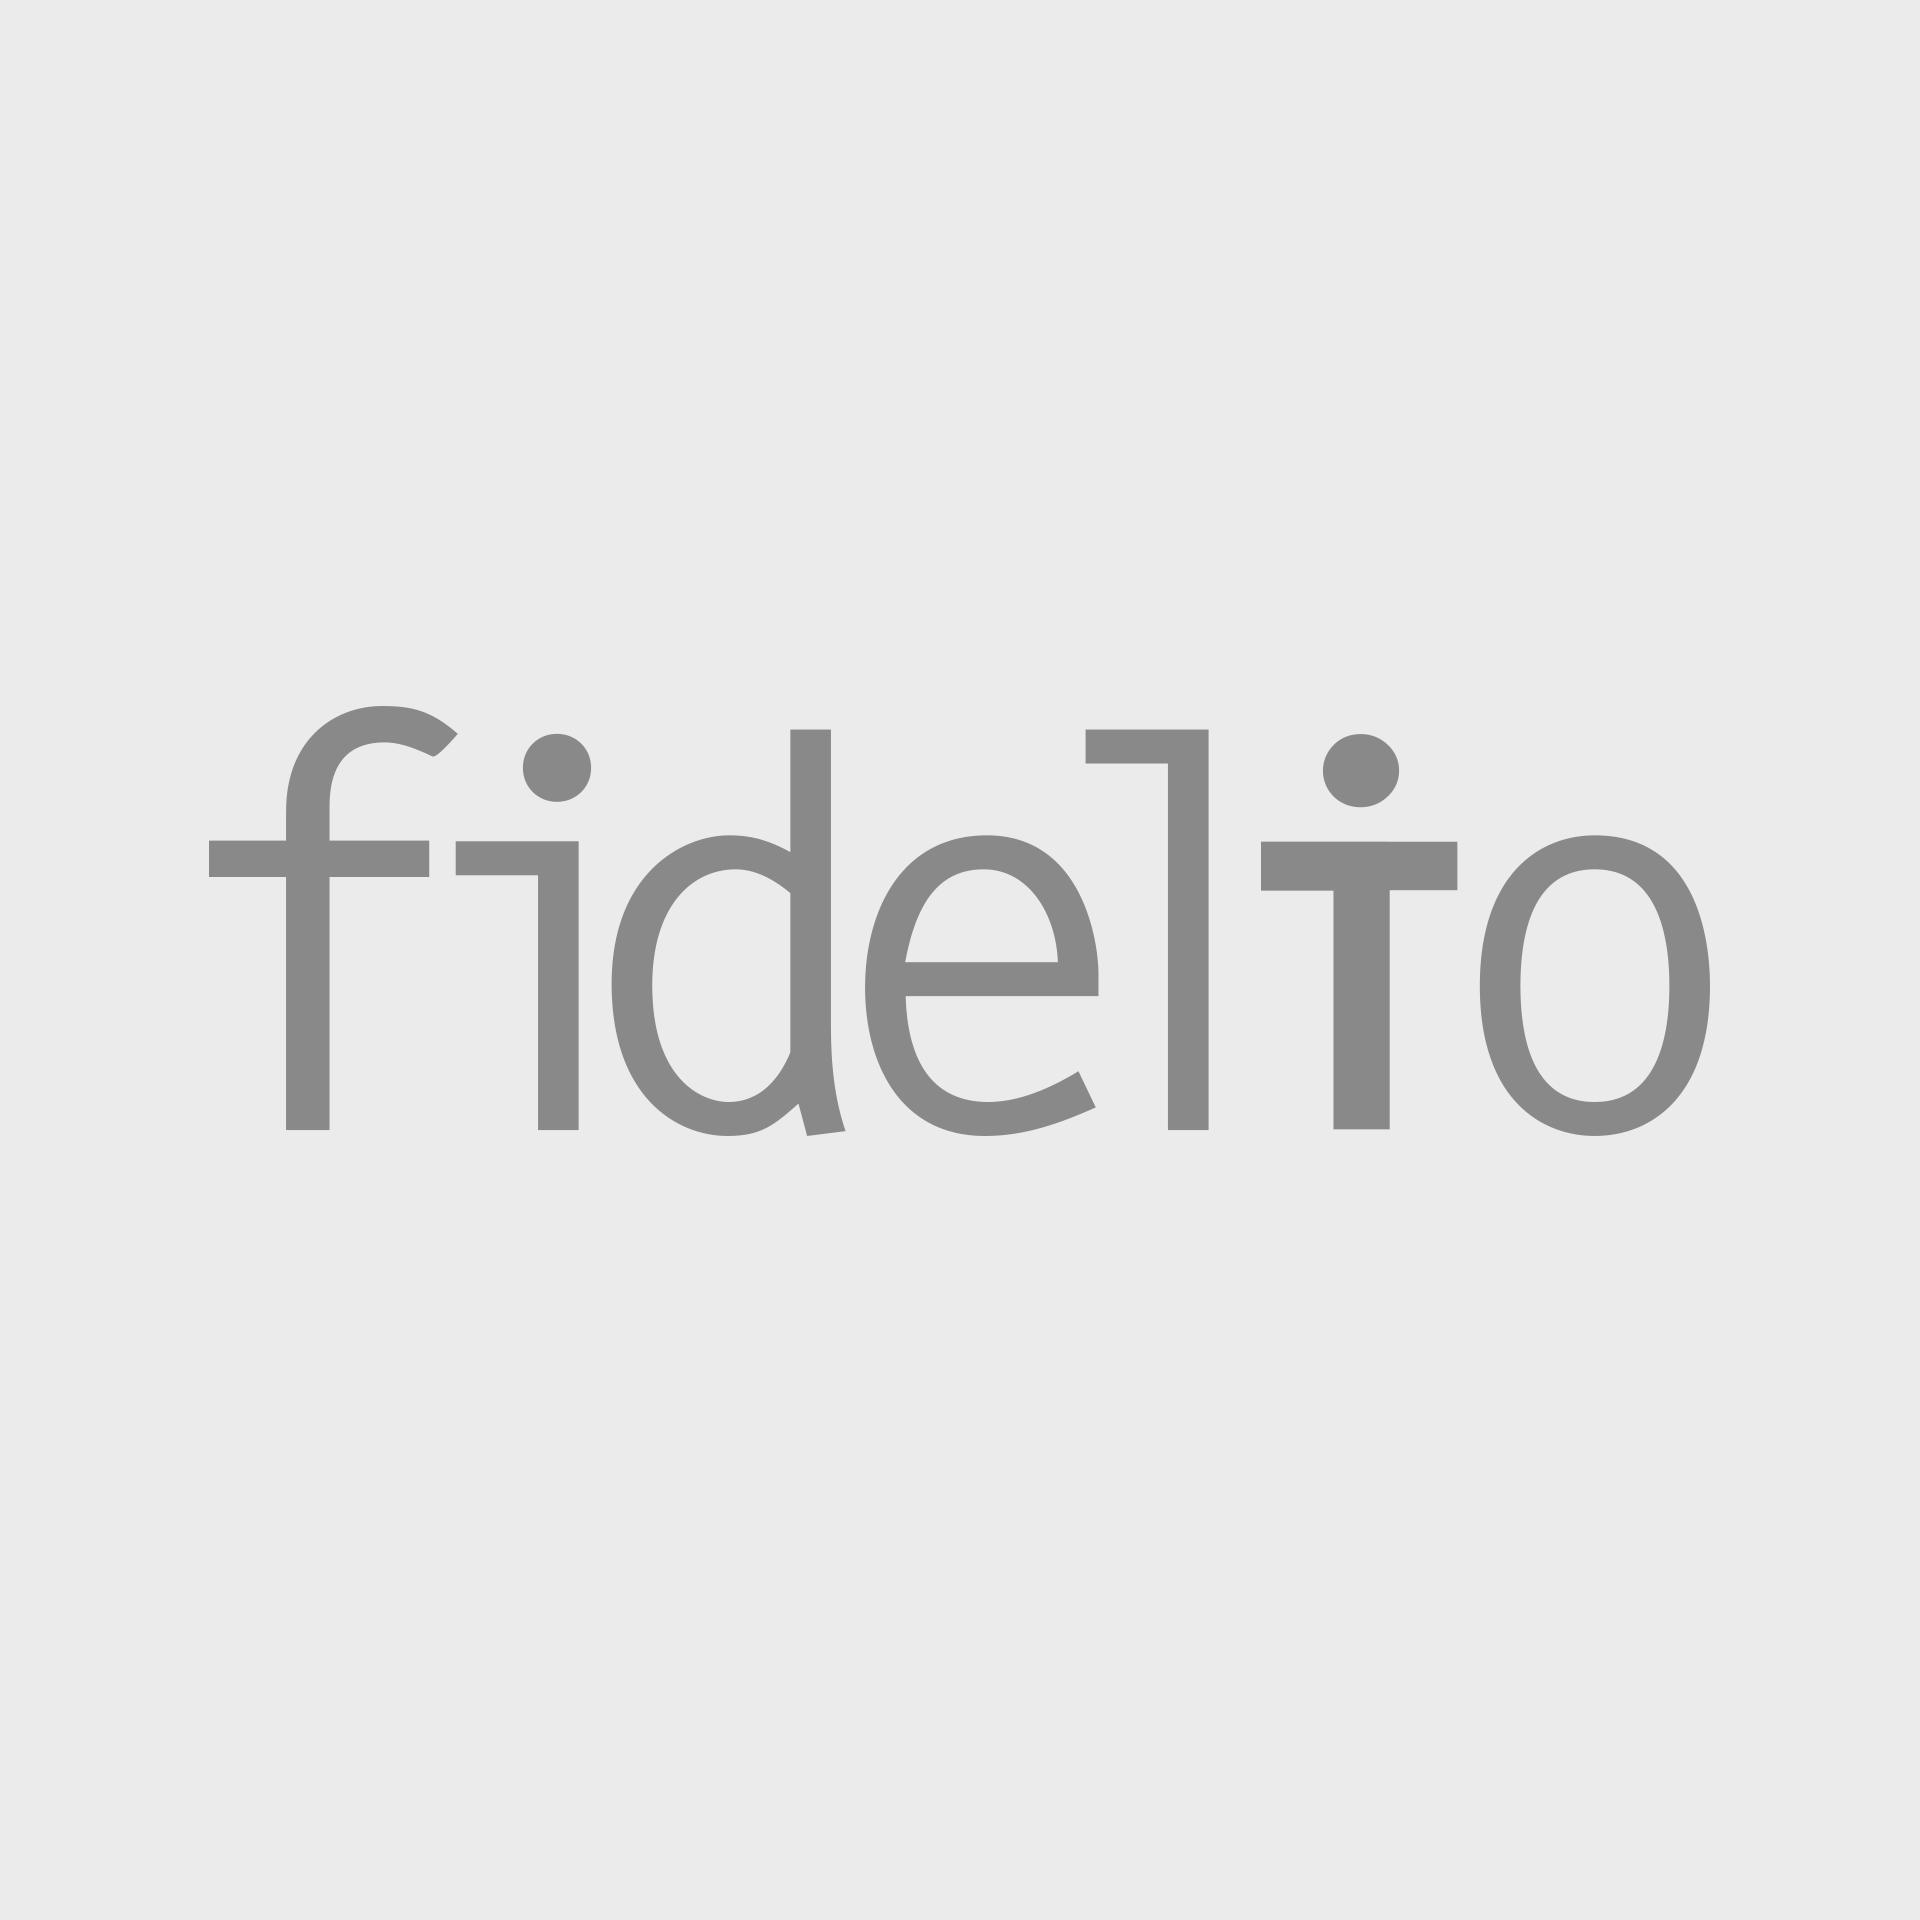 Fidelio Napi Zene – Einojuhani Rautavaara: Cantus Arcticus